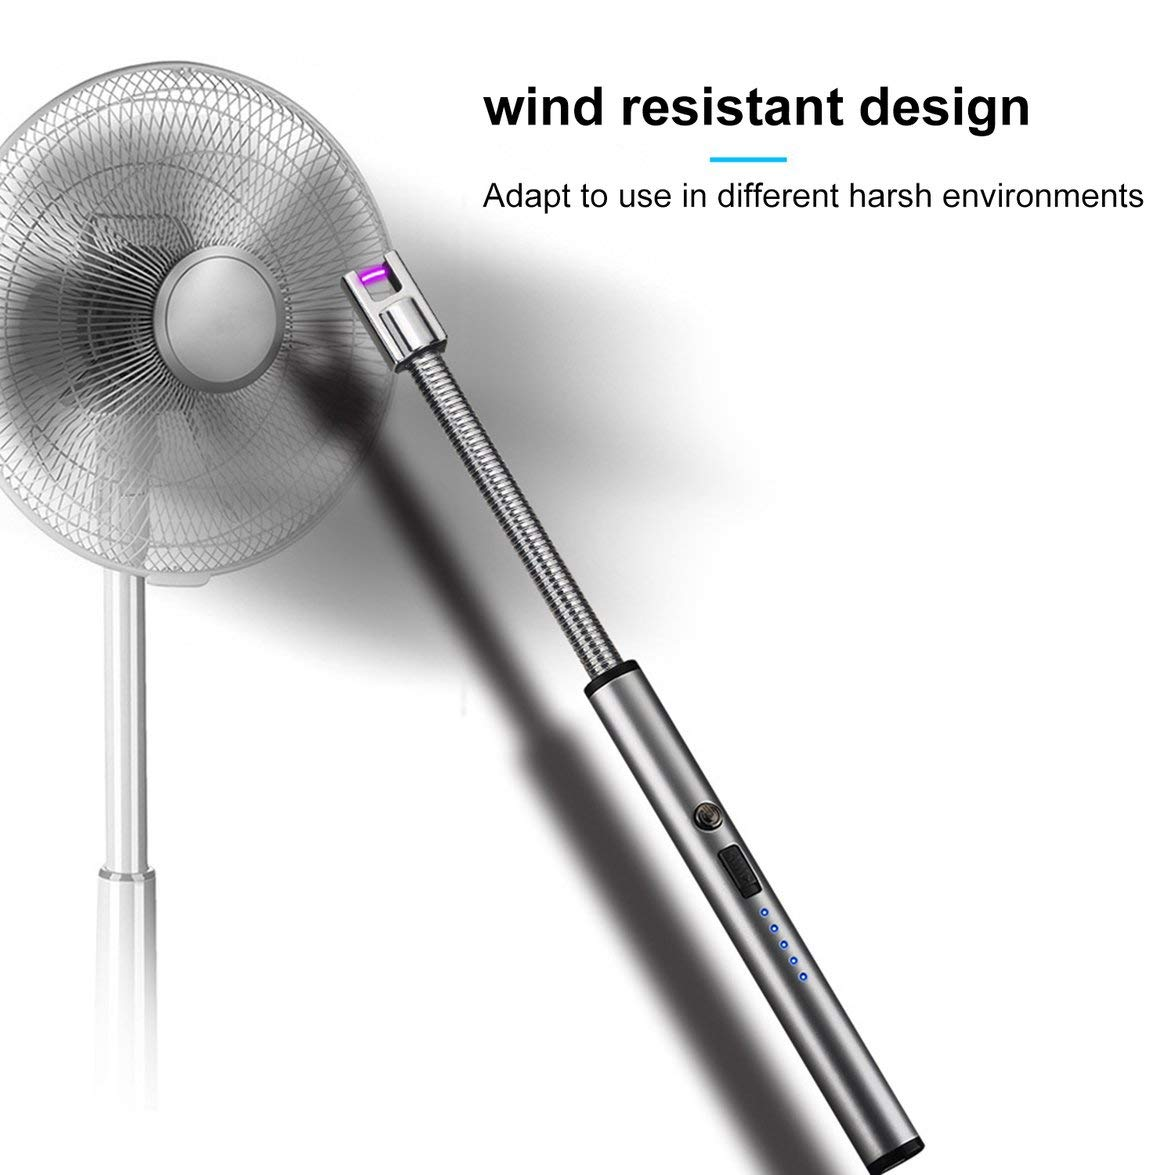 Kongqiabona USB Pulsschlauch Elektro Feuerzeug 360 Grad Rotation Wiederaufladbare Lgnition Pistole